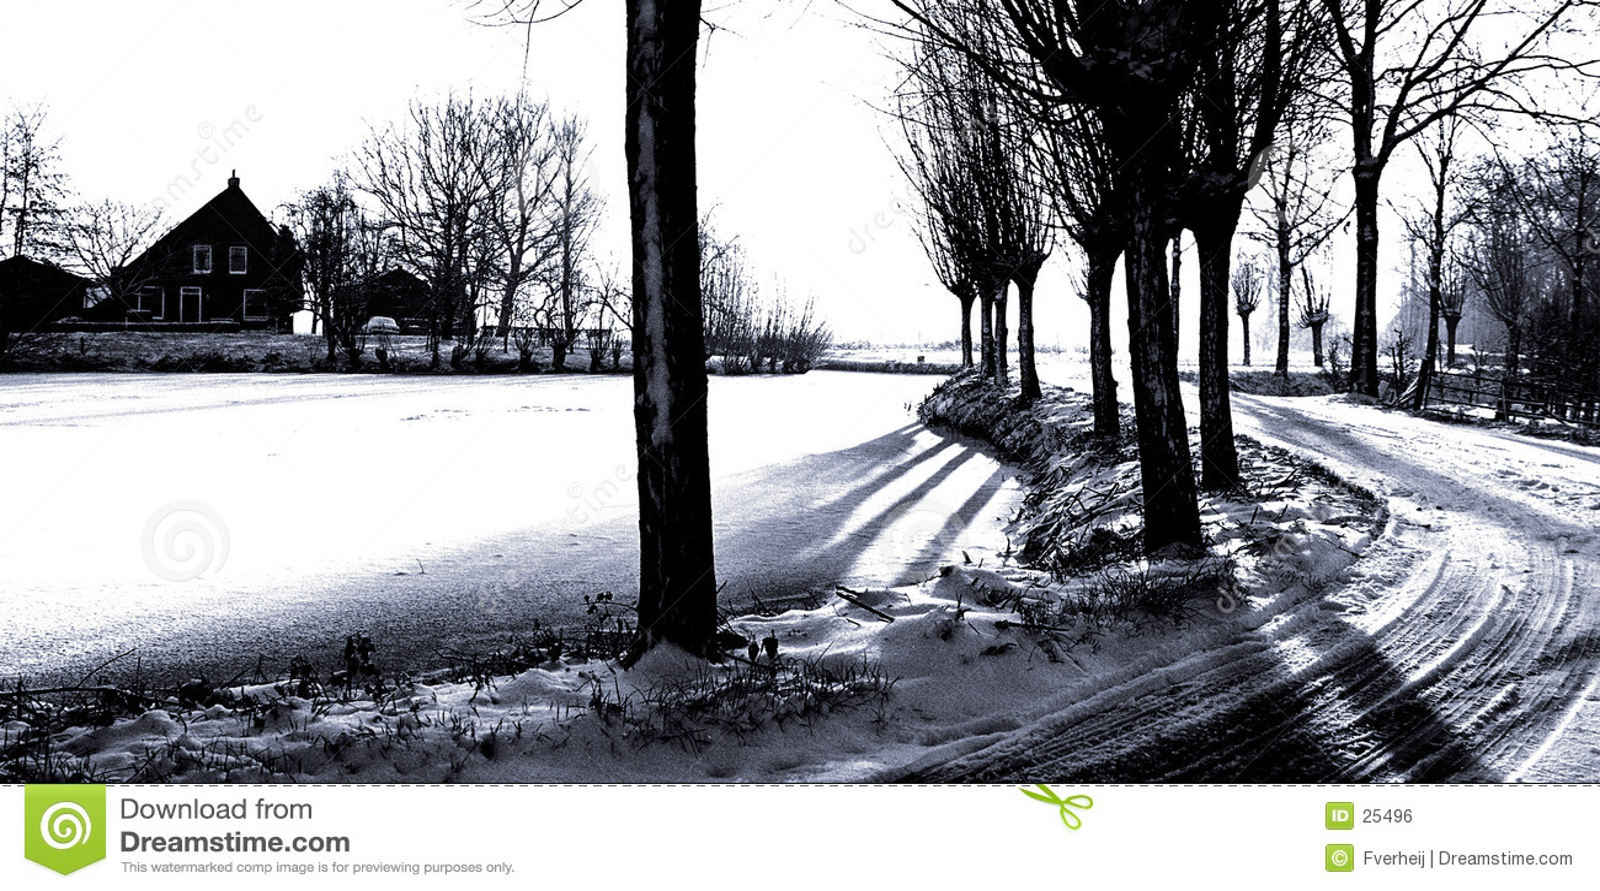 Fv grafiki winterland